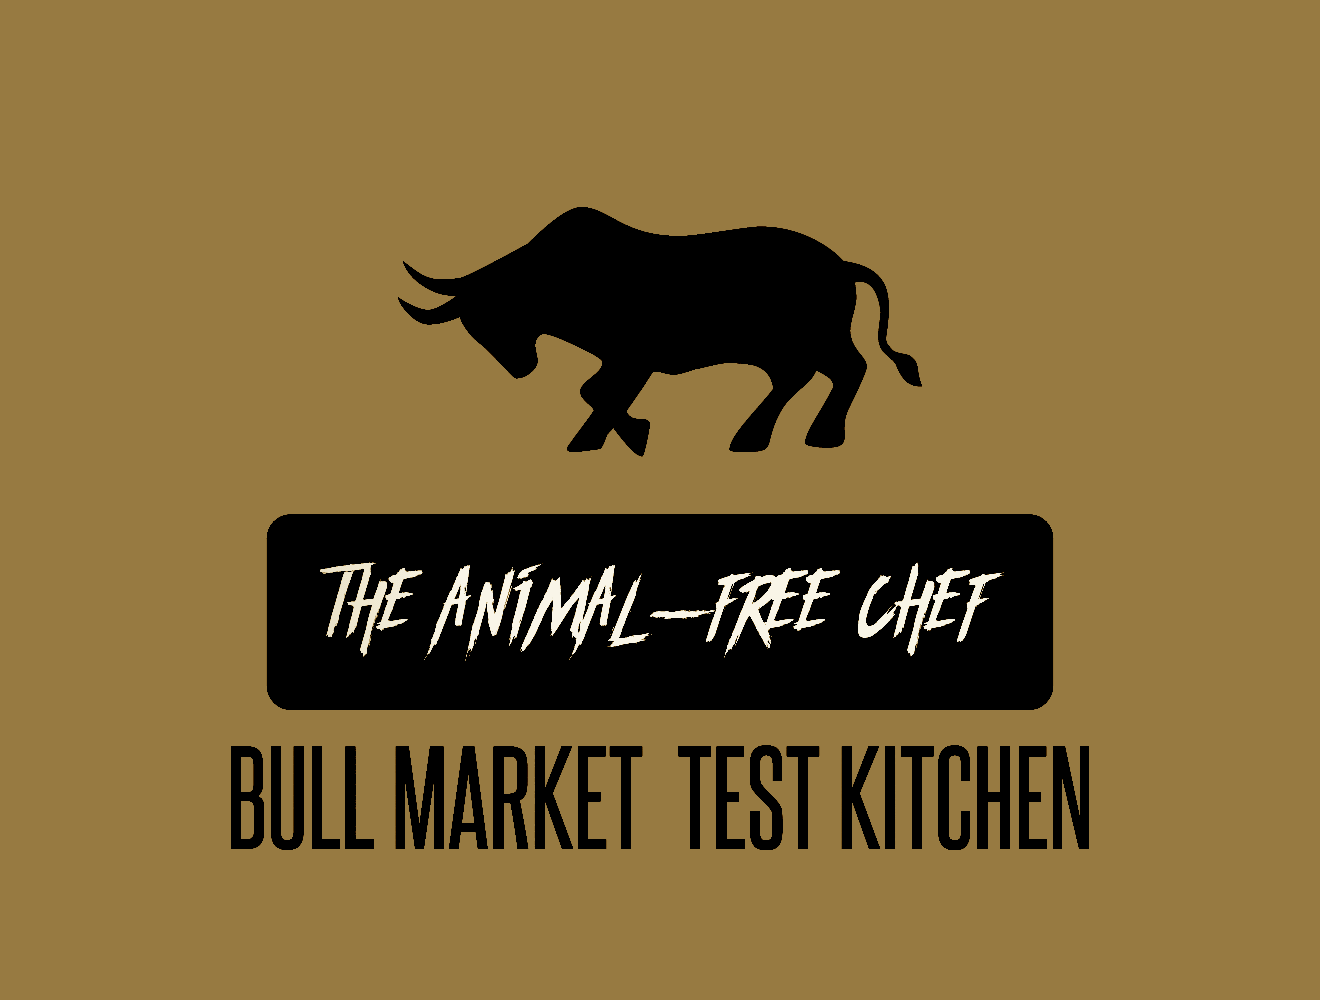 THE ANIMAL-FREE CHEF™